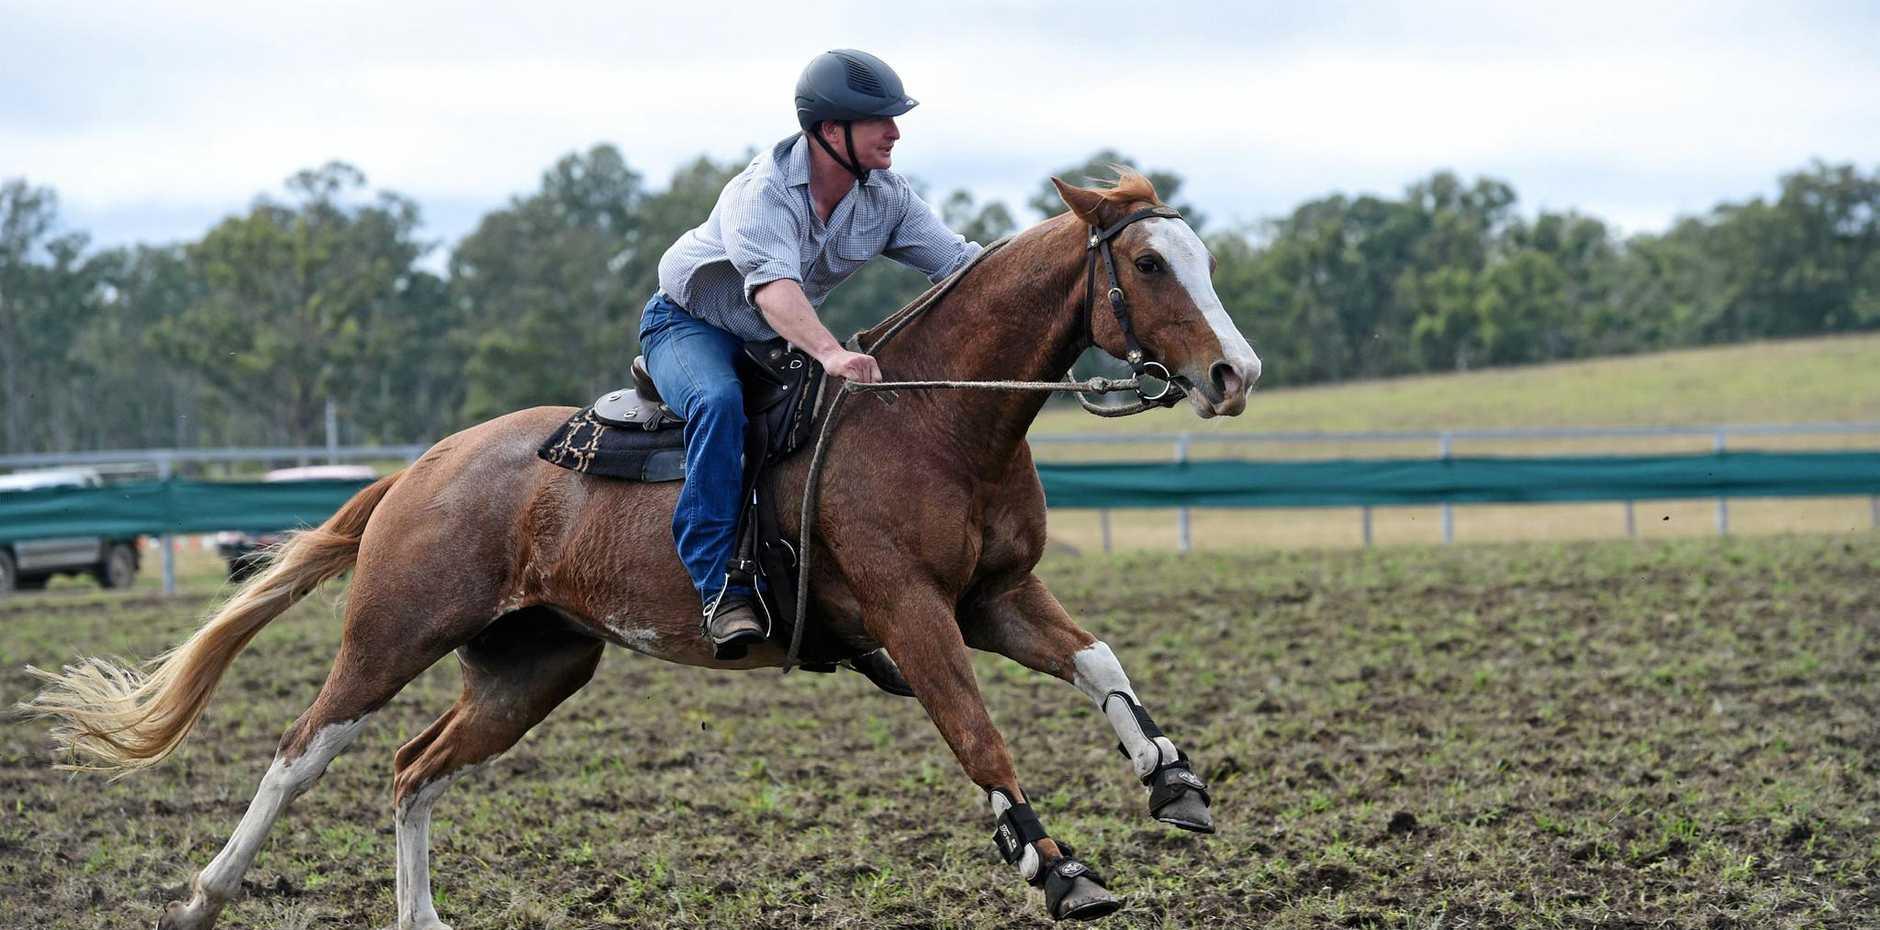 Teebar Rodeo and Campdraft - Mark Wortman on Beau.